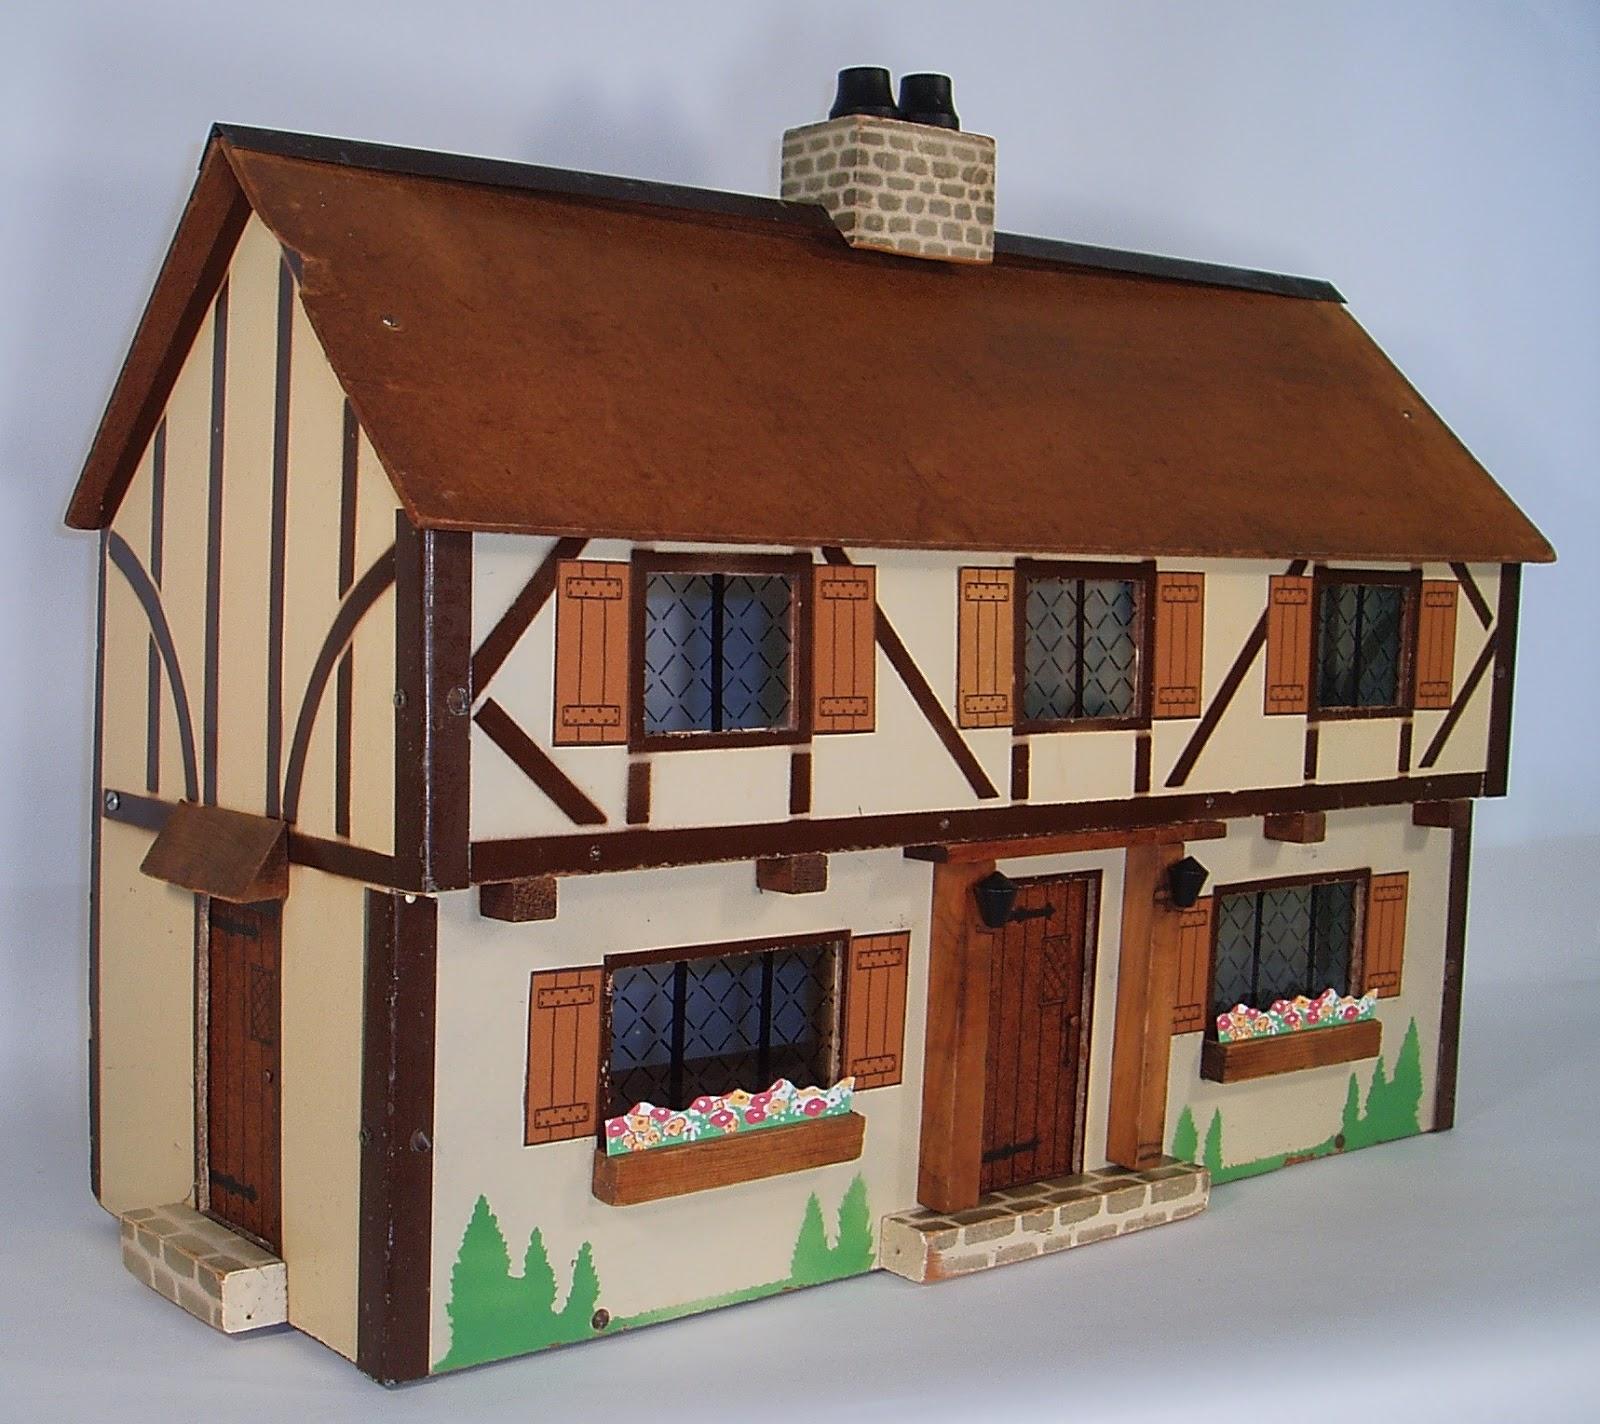 What Makes A House A Tudor rich manufacturing company dollhousesrita goranson - dolls